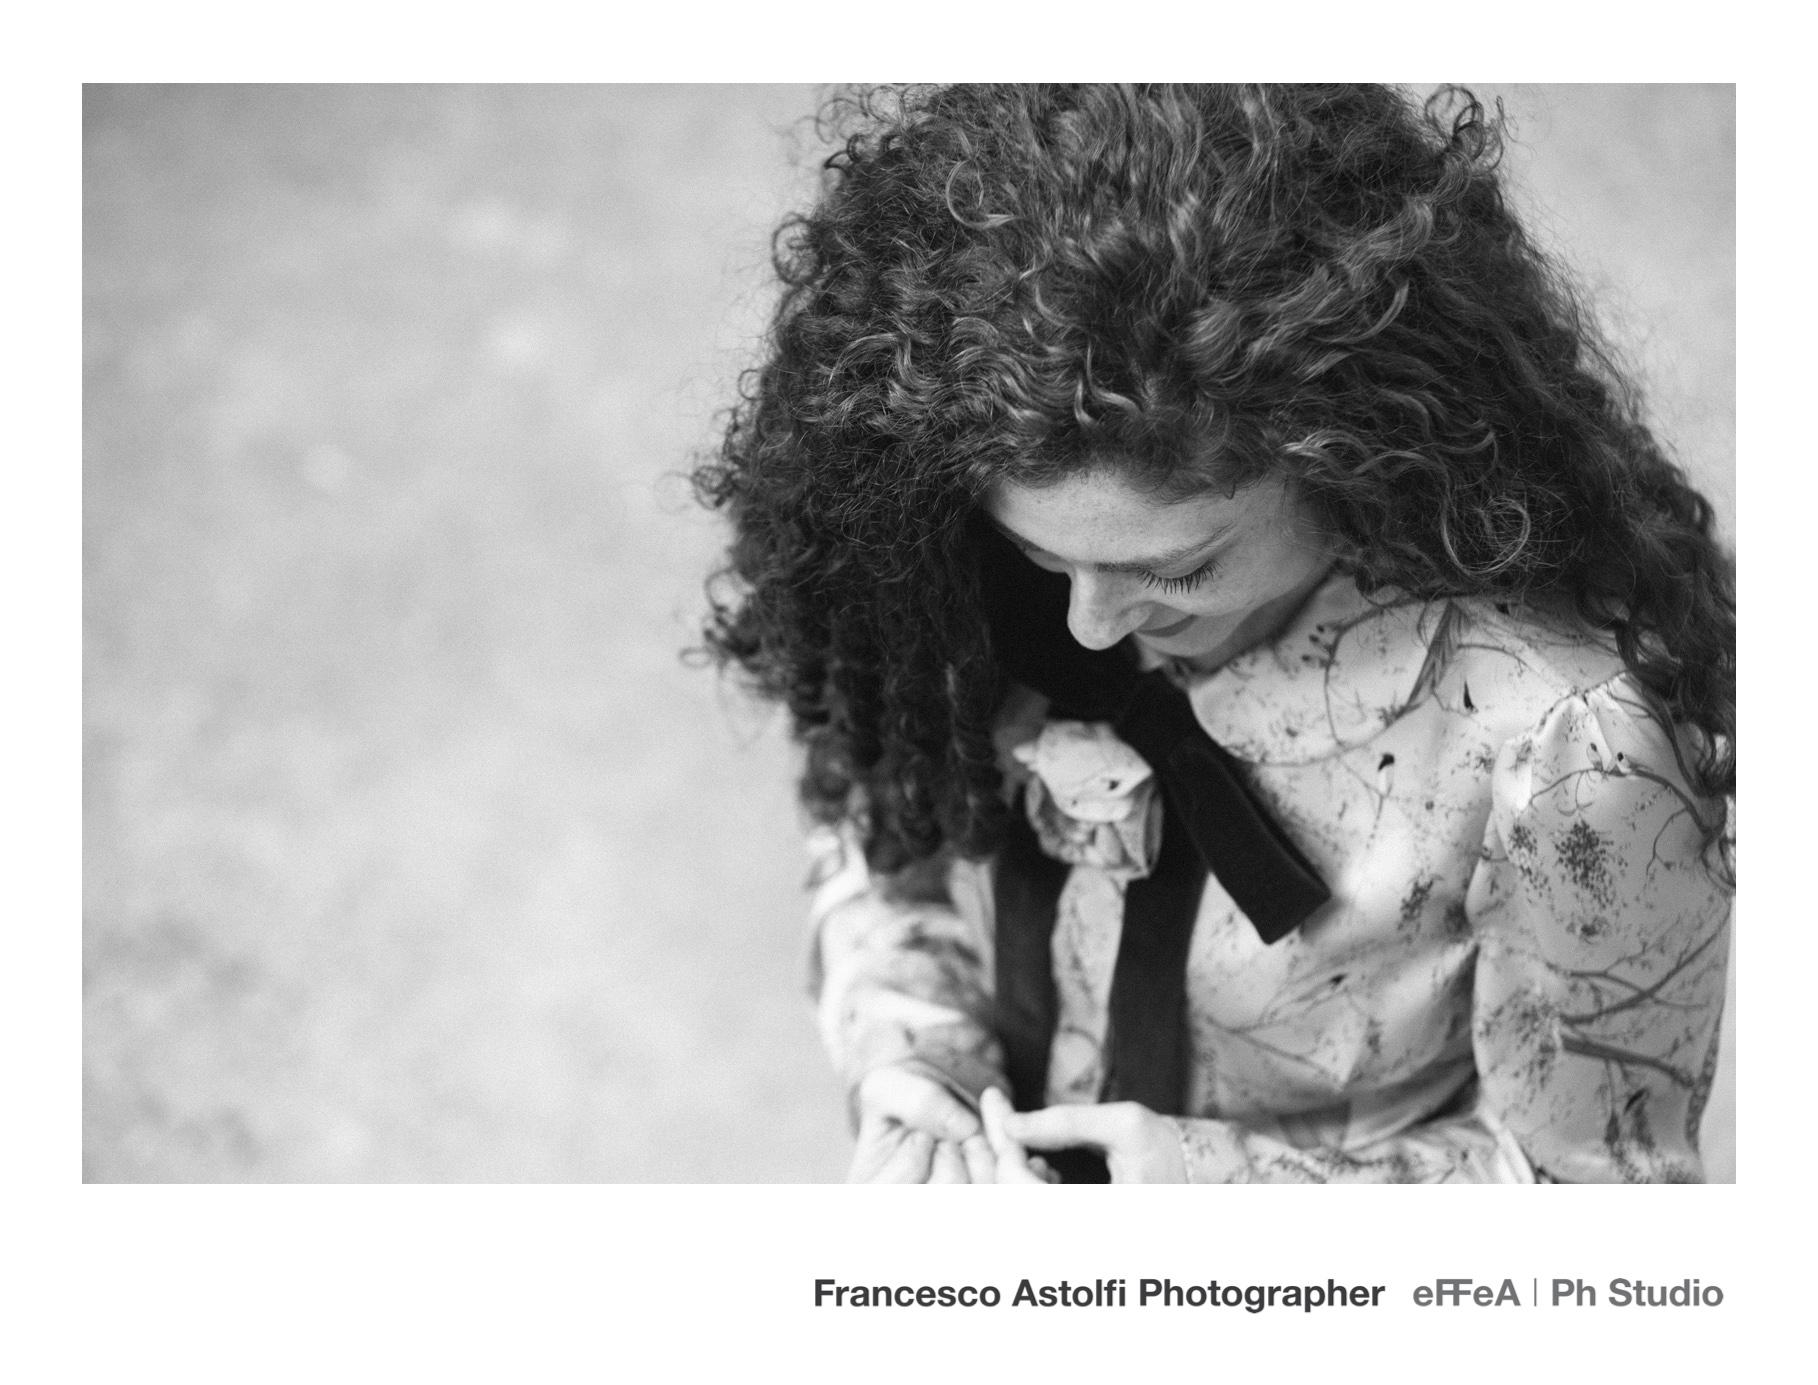 002 - Gentile Catone - Photo by Francesco Astolfi